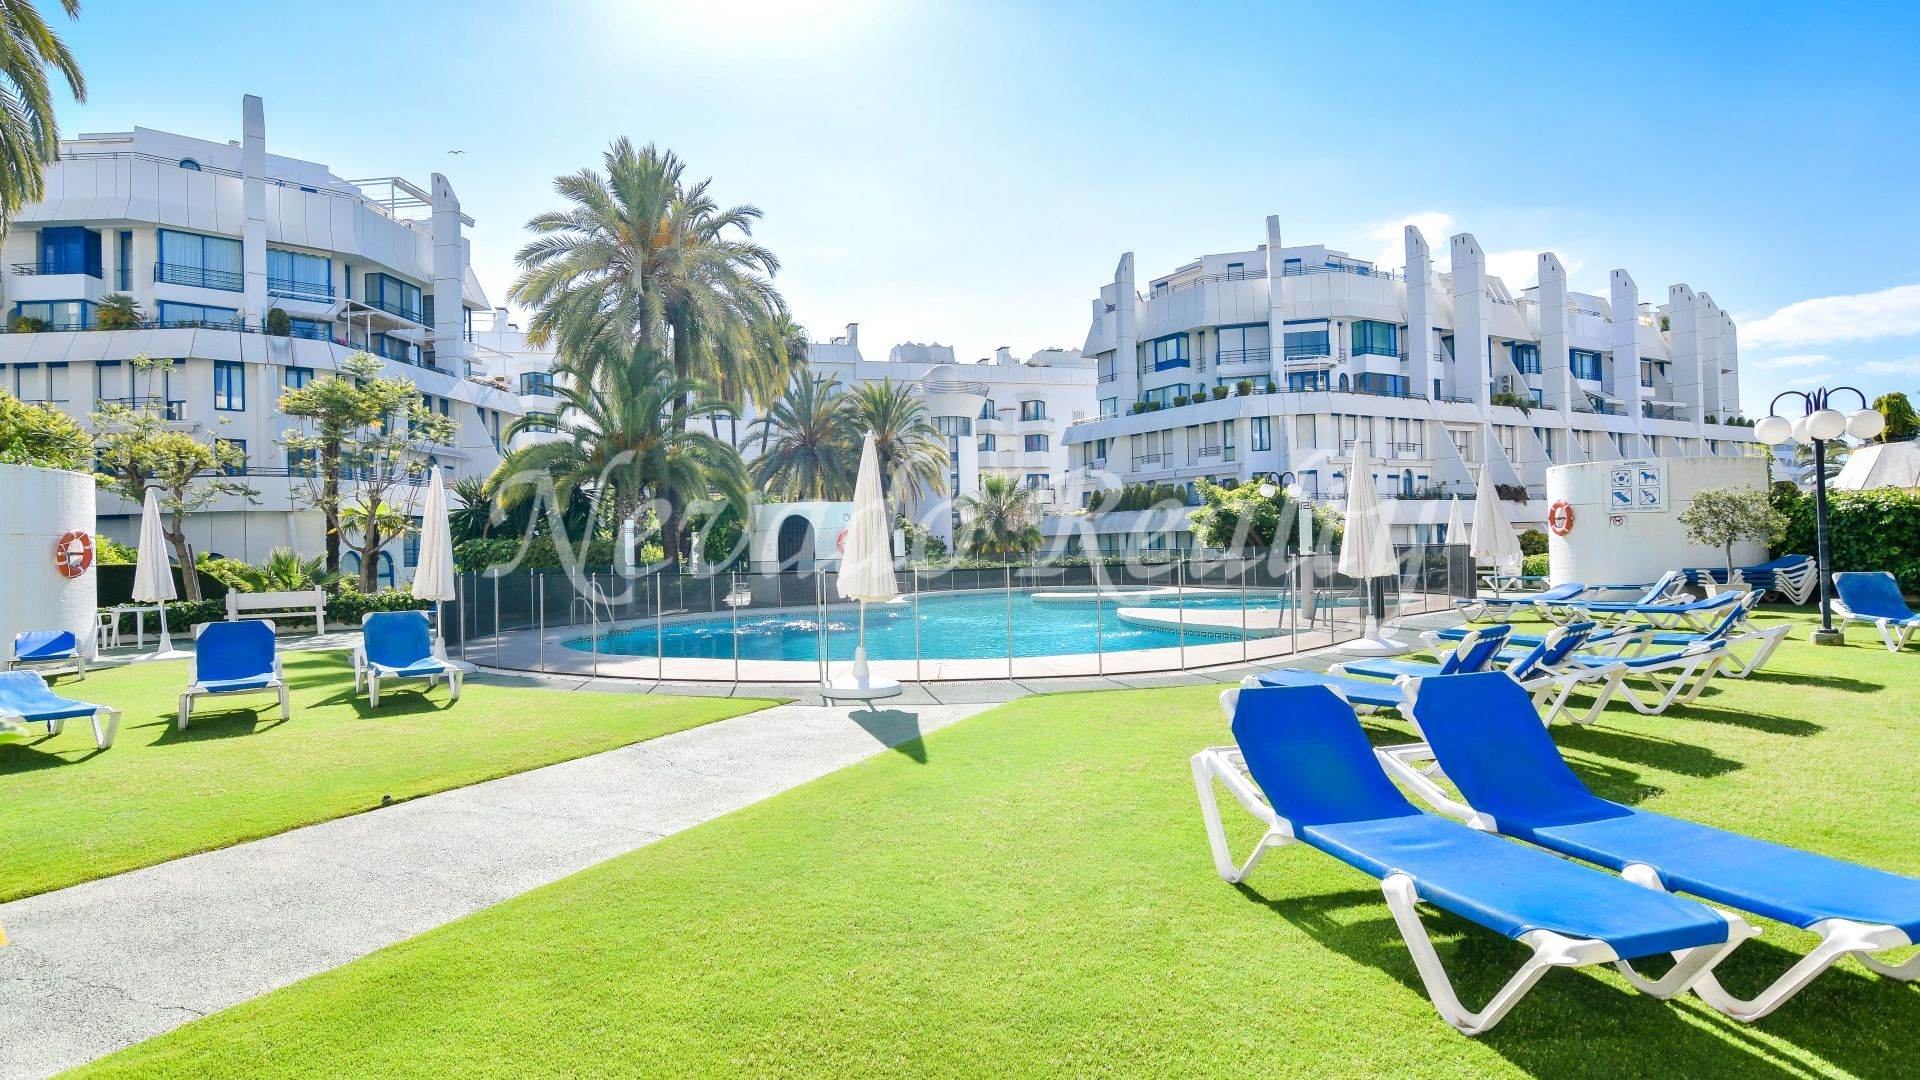 Cozy Groundfloor Beachside Apartment For Sale In Marbella Center